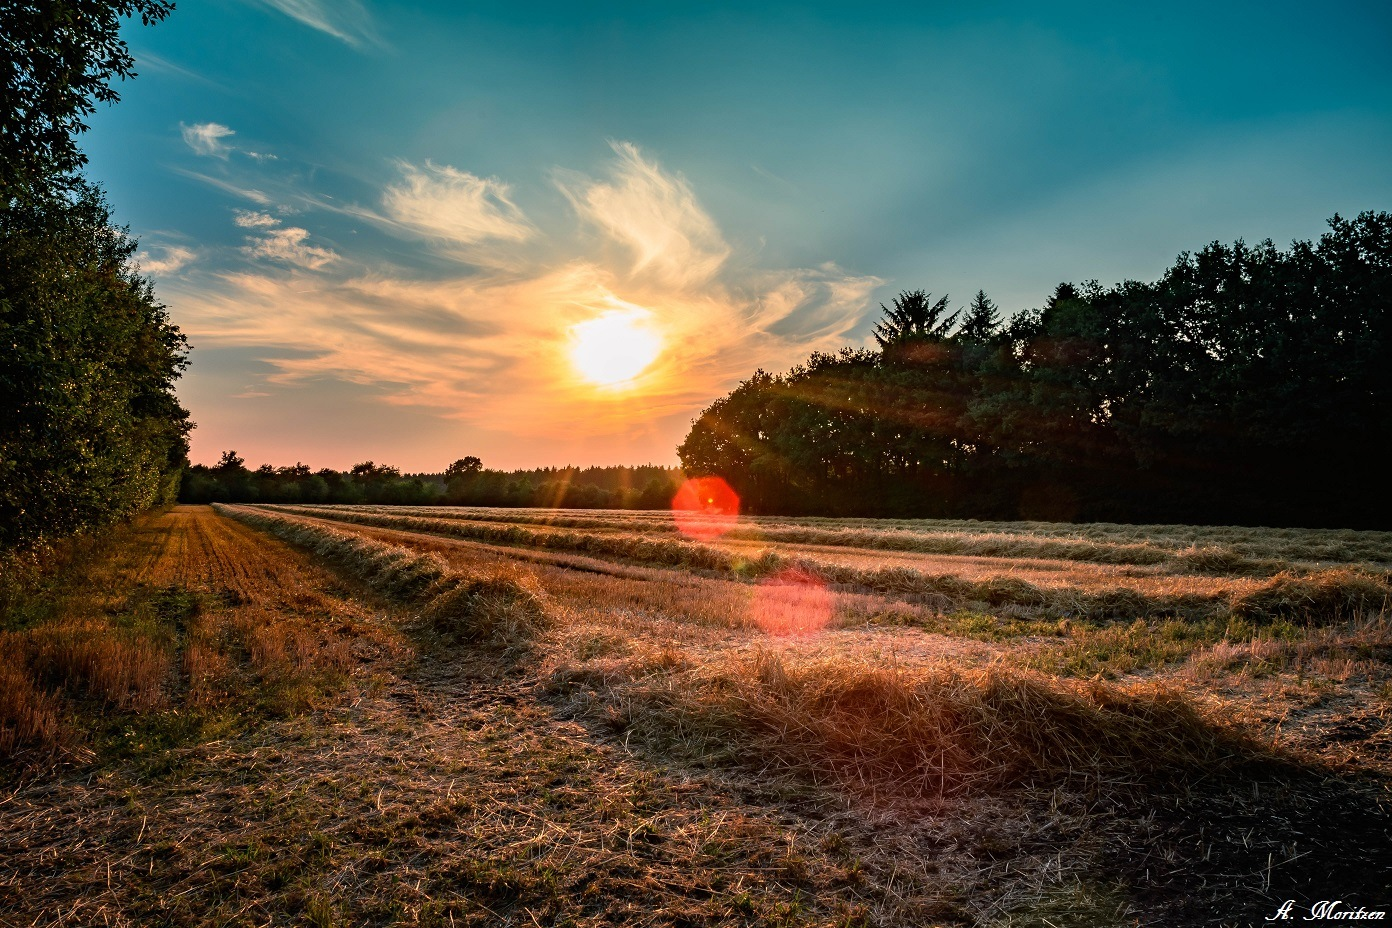 Wonderful sunset  by A. Mor. Reflections (Antje Moritzen)